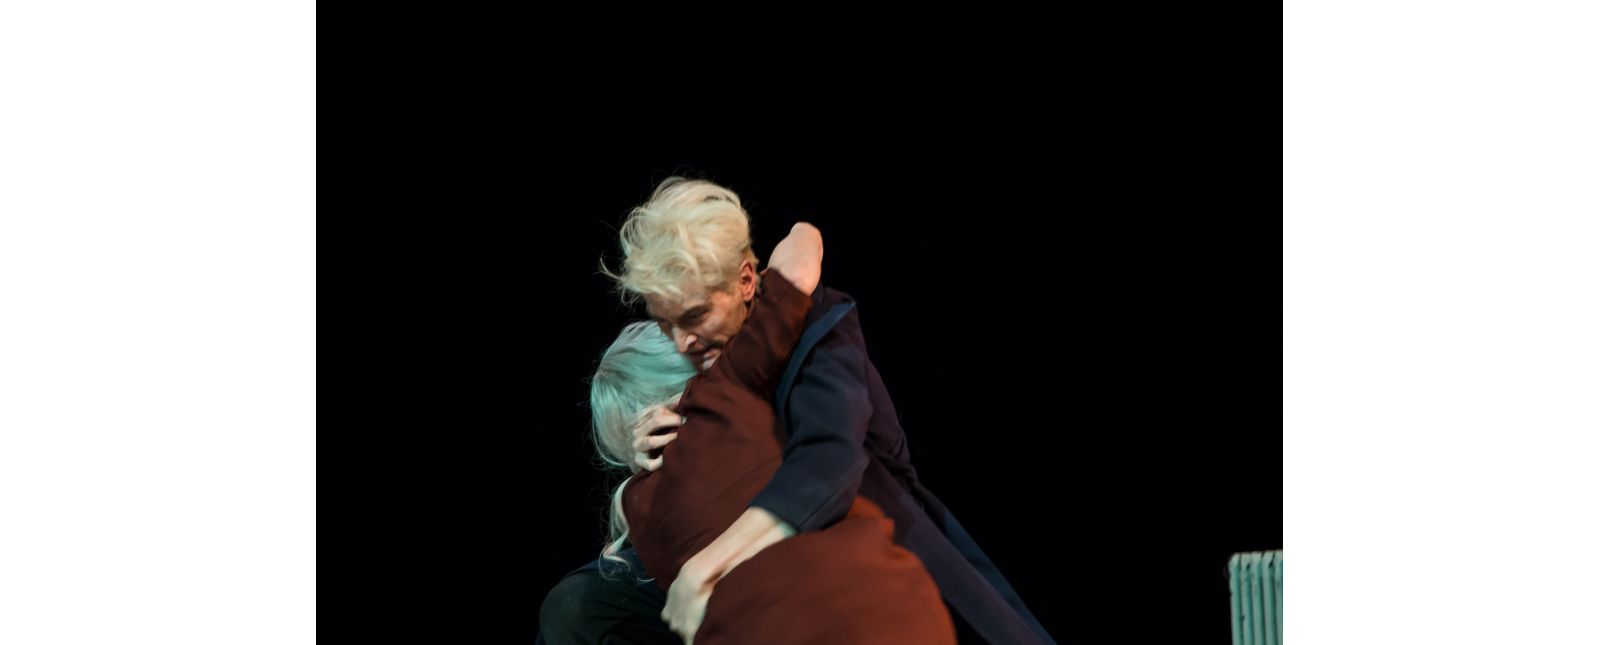 Totentanz // Marieke Kregel, Victor Calero // 2017 // Laura Nickel